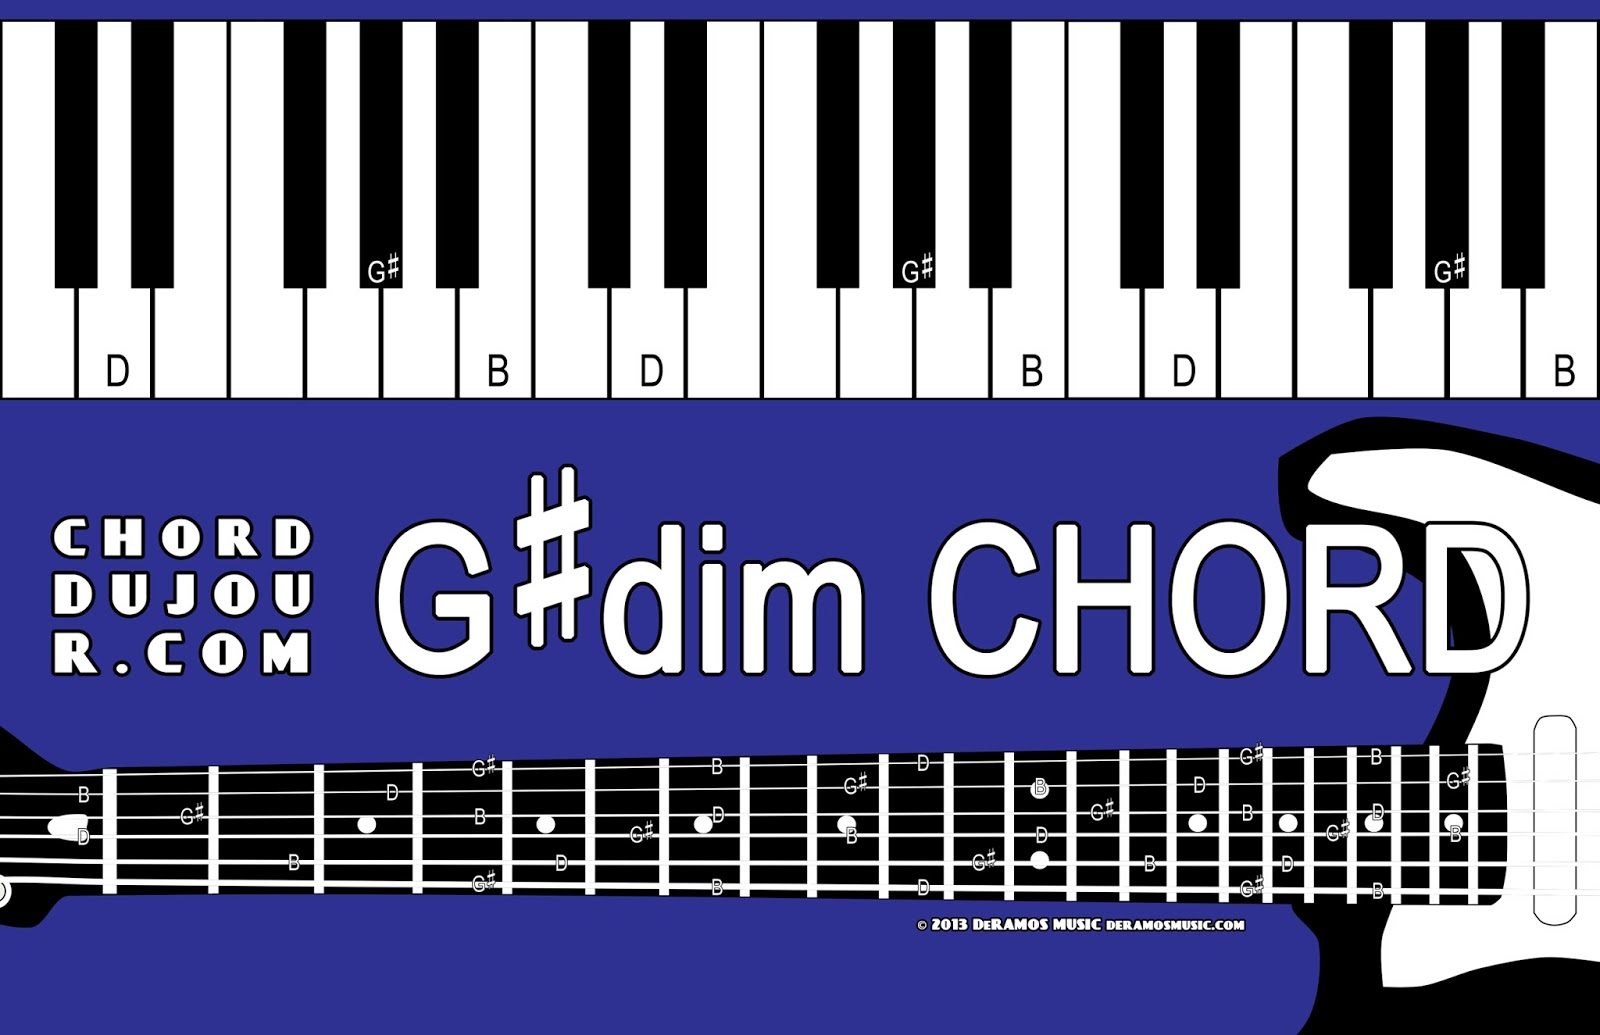 Chord Du Jour Dictionary Gdim Chord